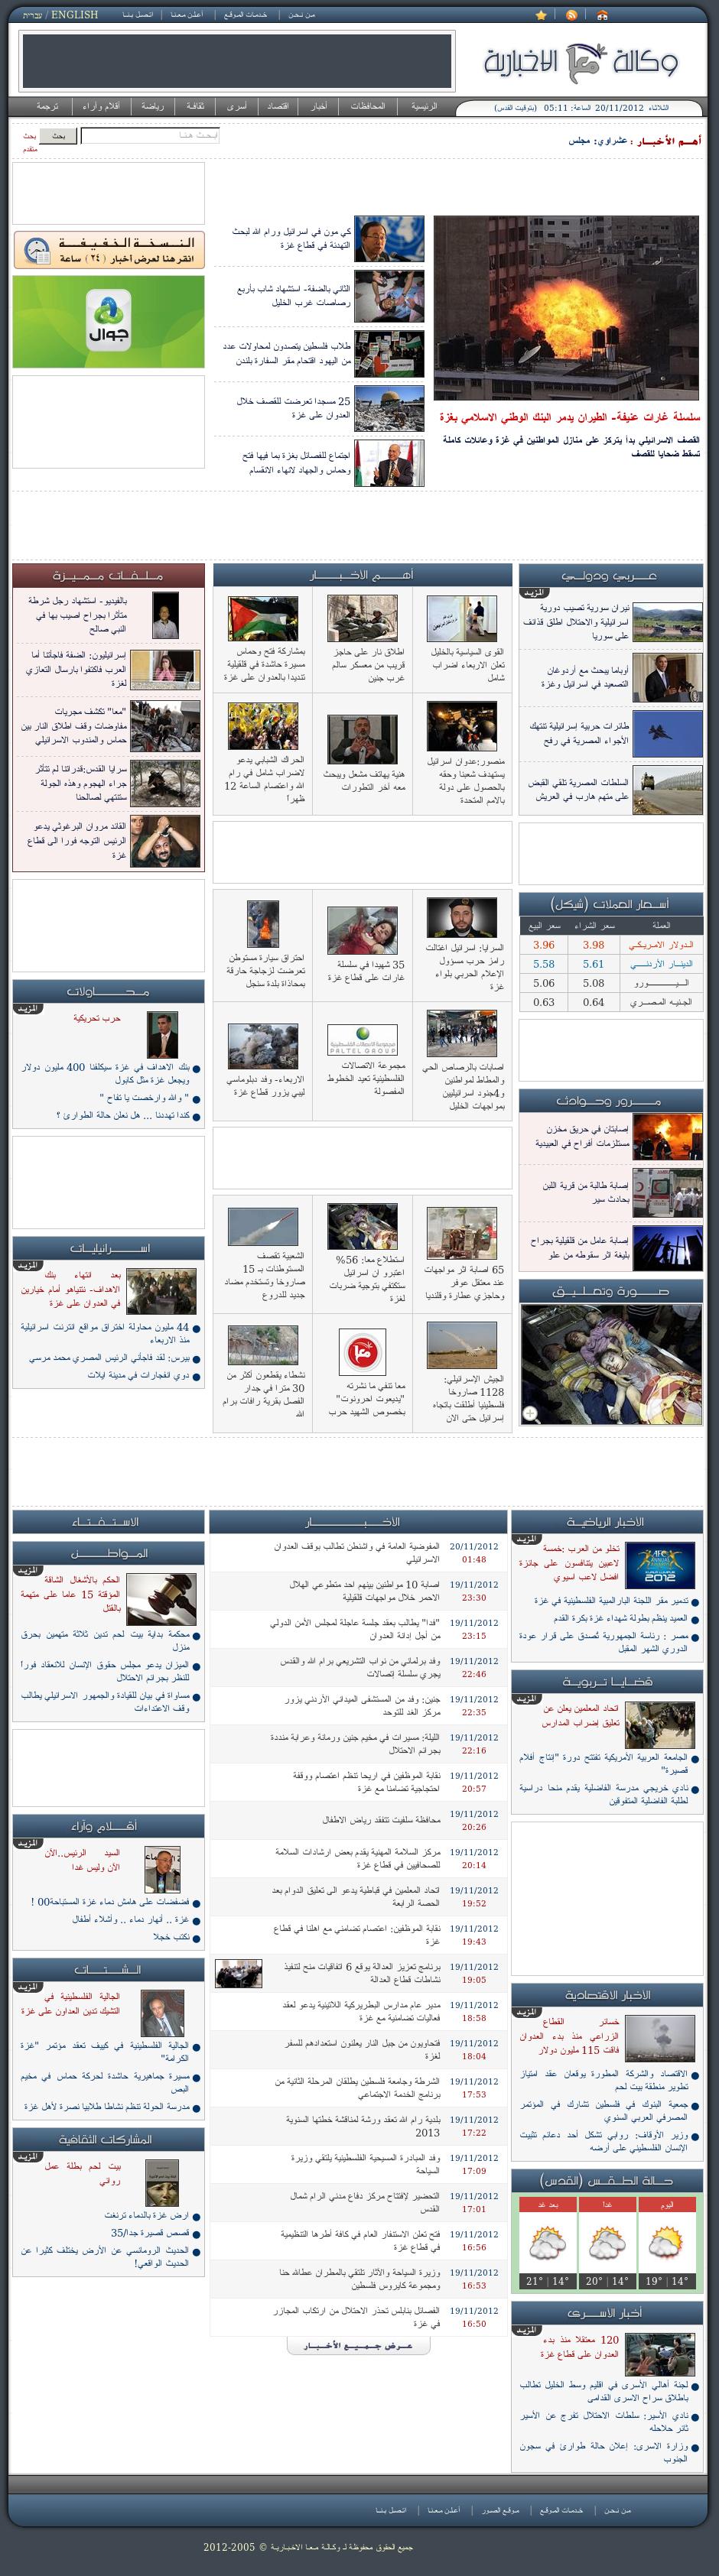 Ma'an News at Tuesday Nov. 20, 2012, 3:17 a.m. UTC